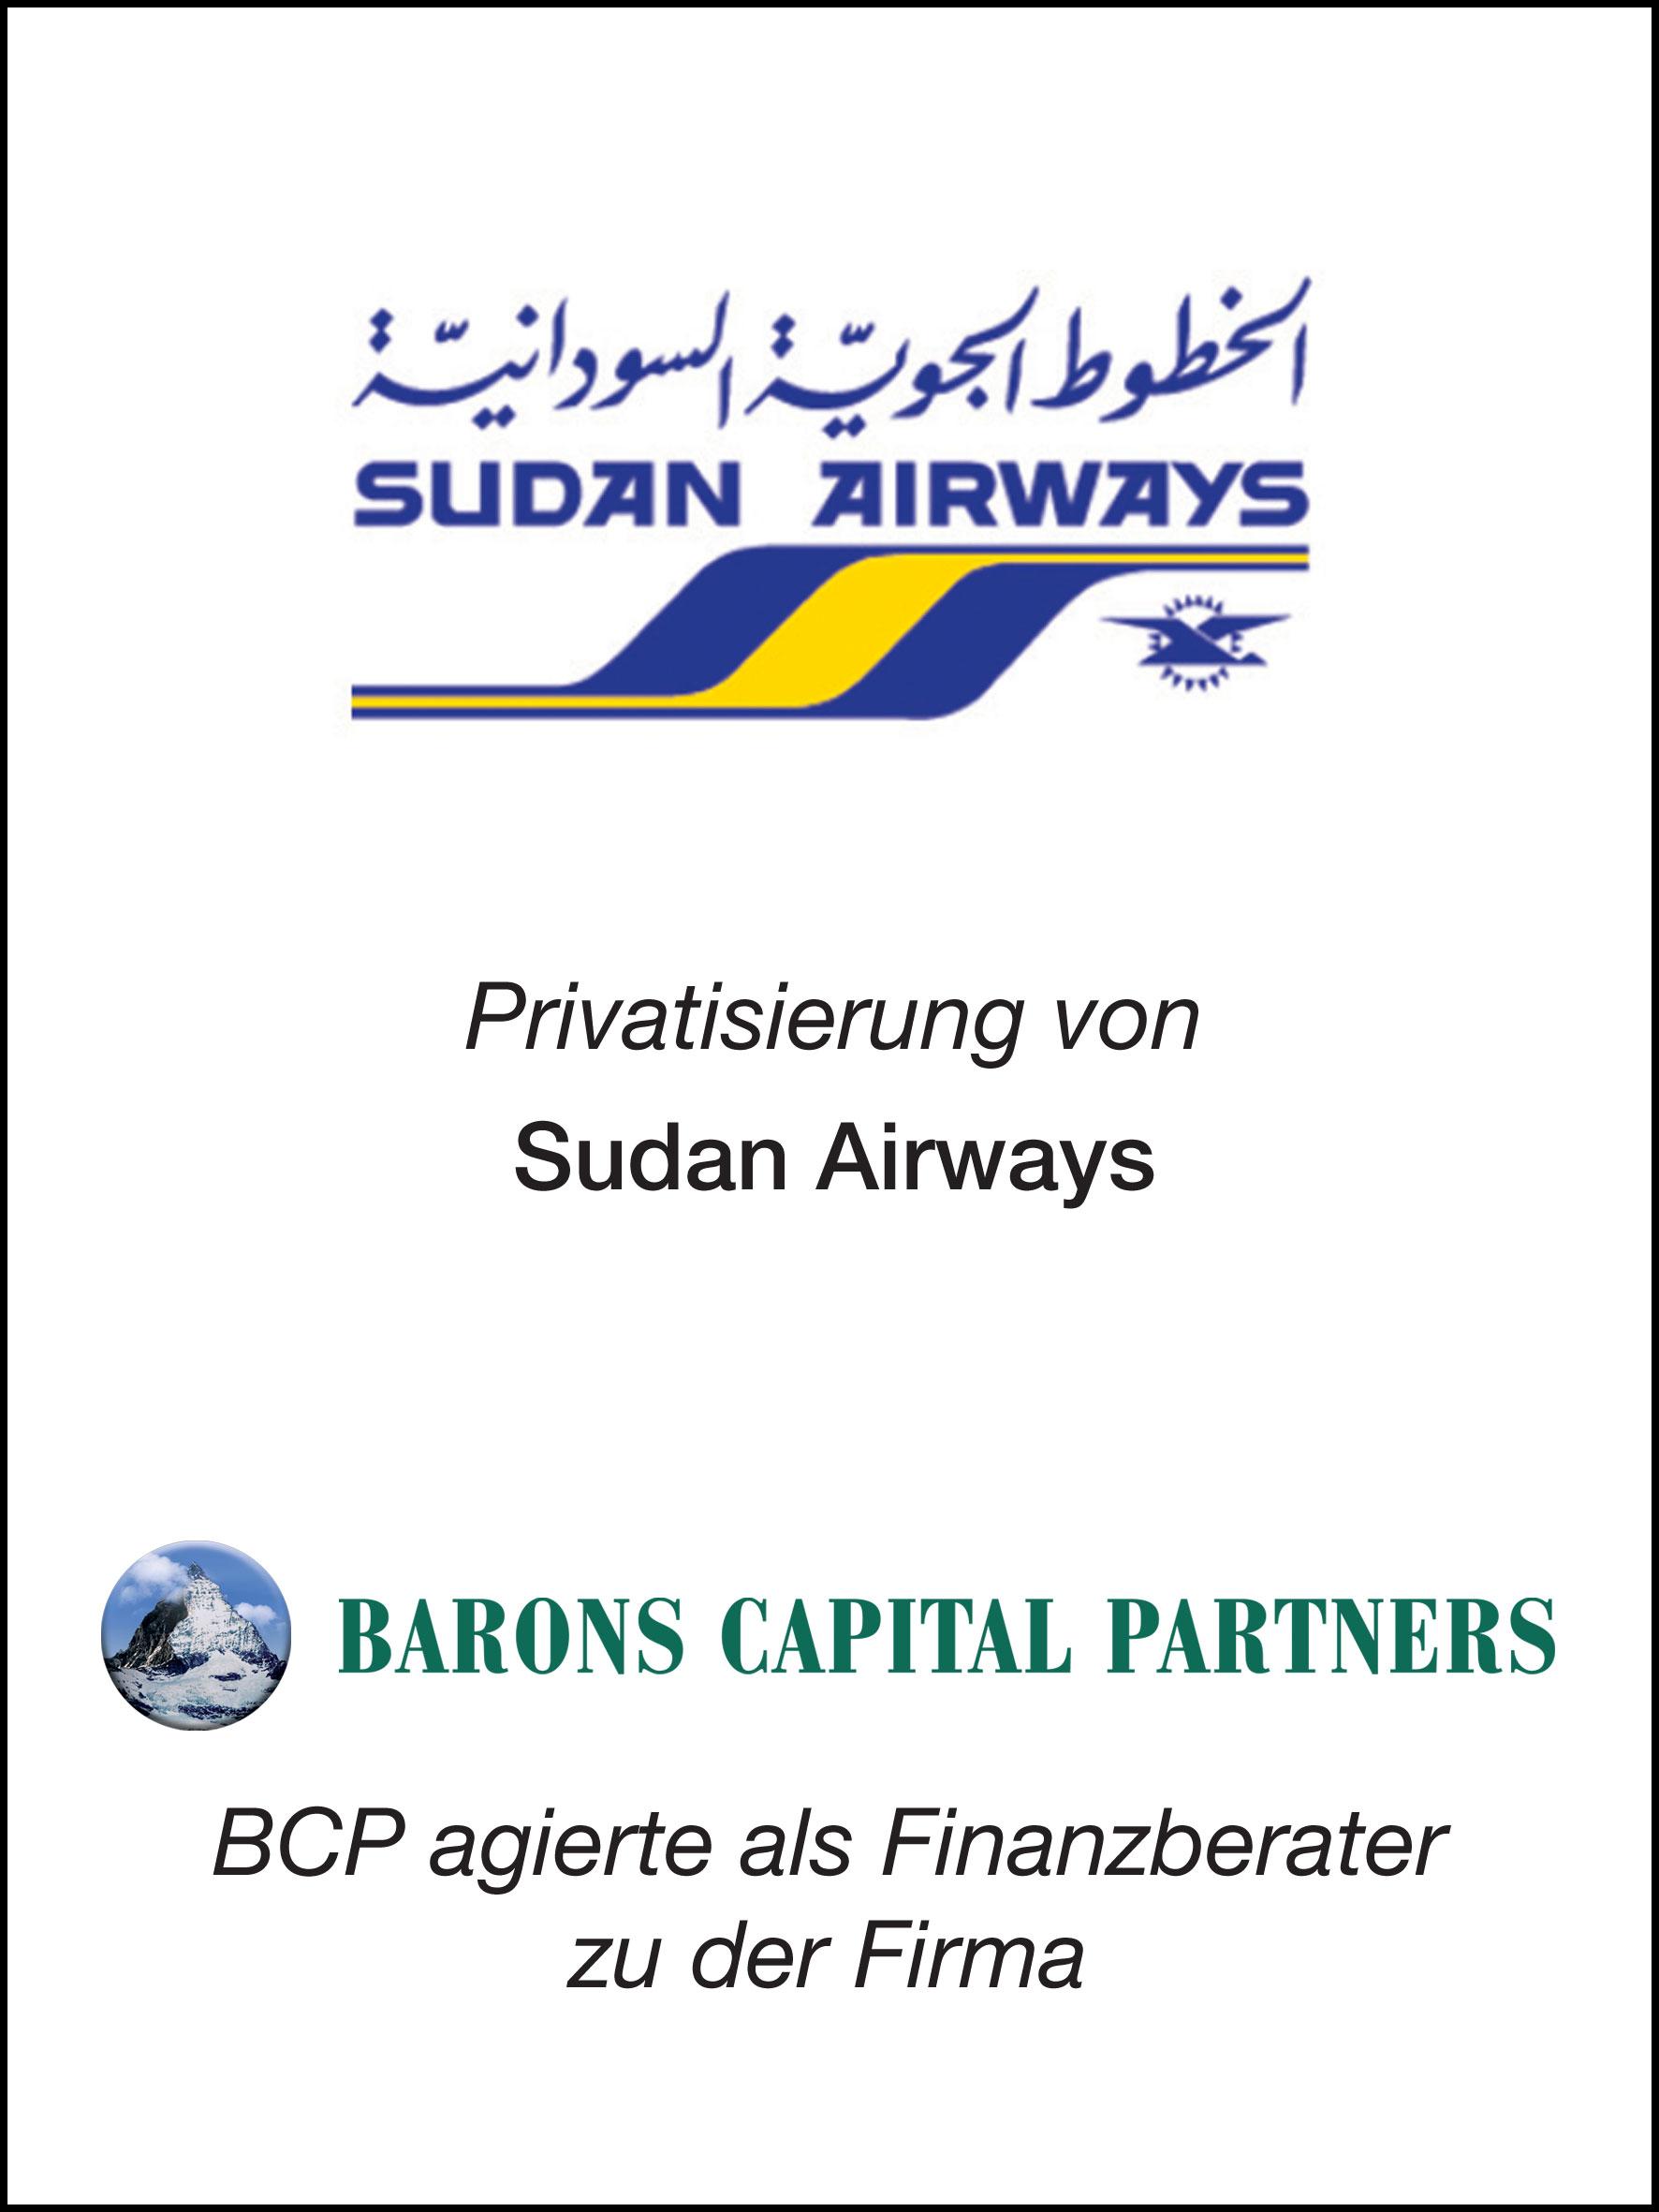 55_Sudan Airways_G